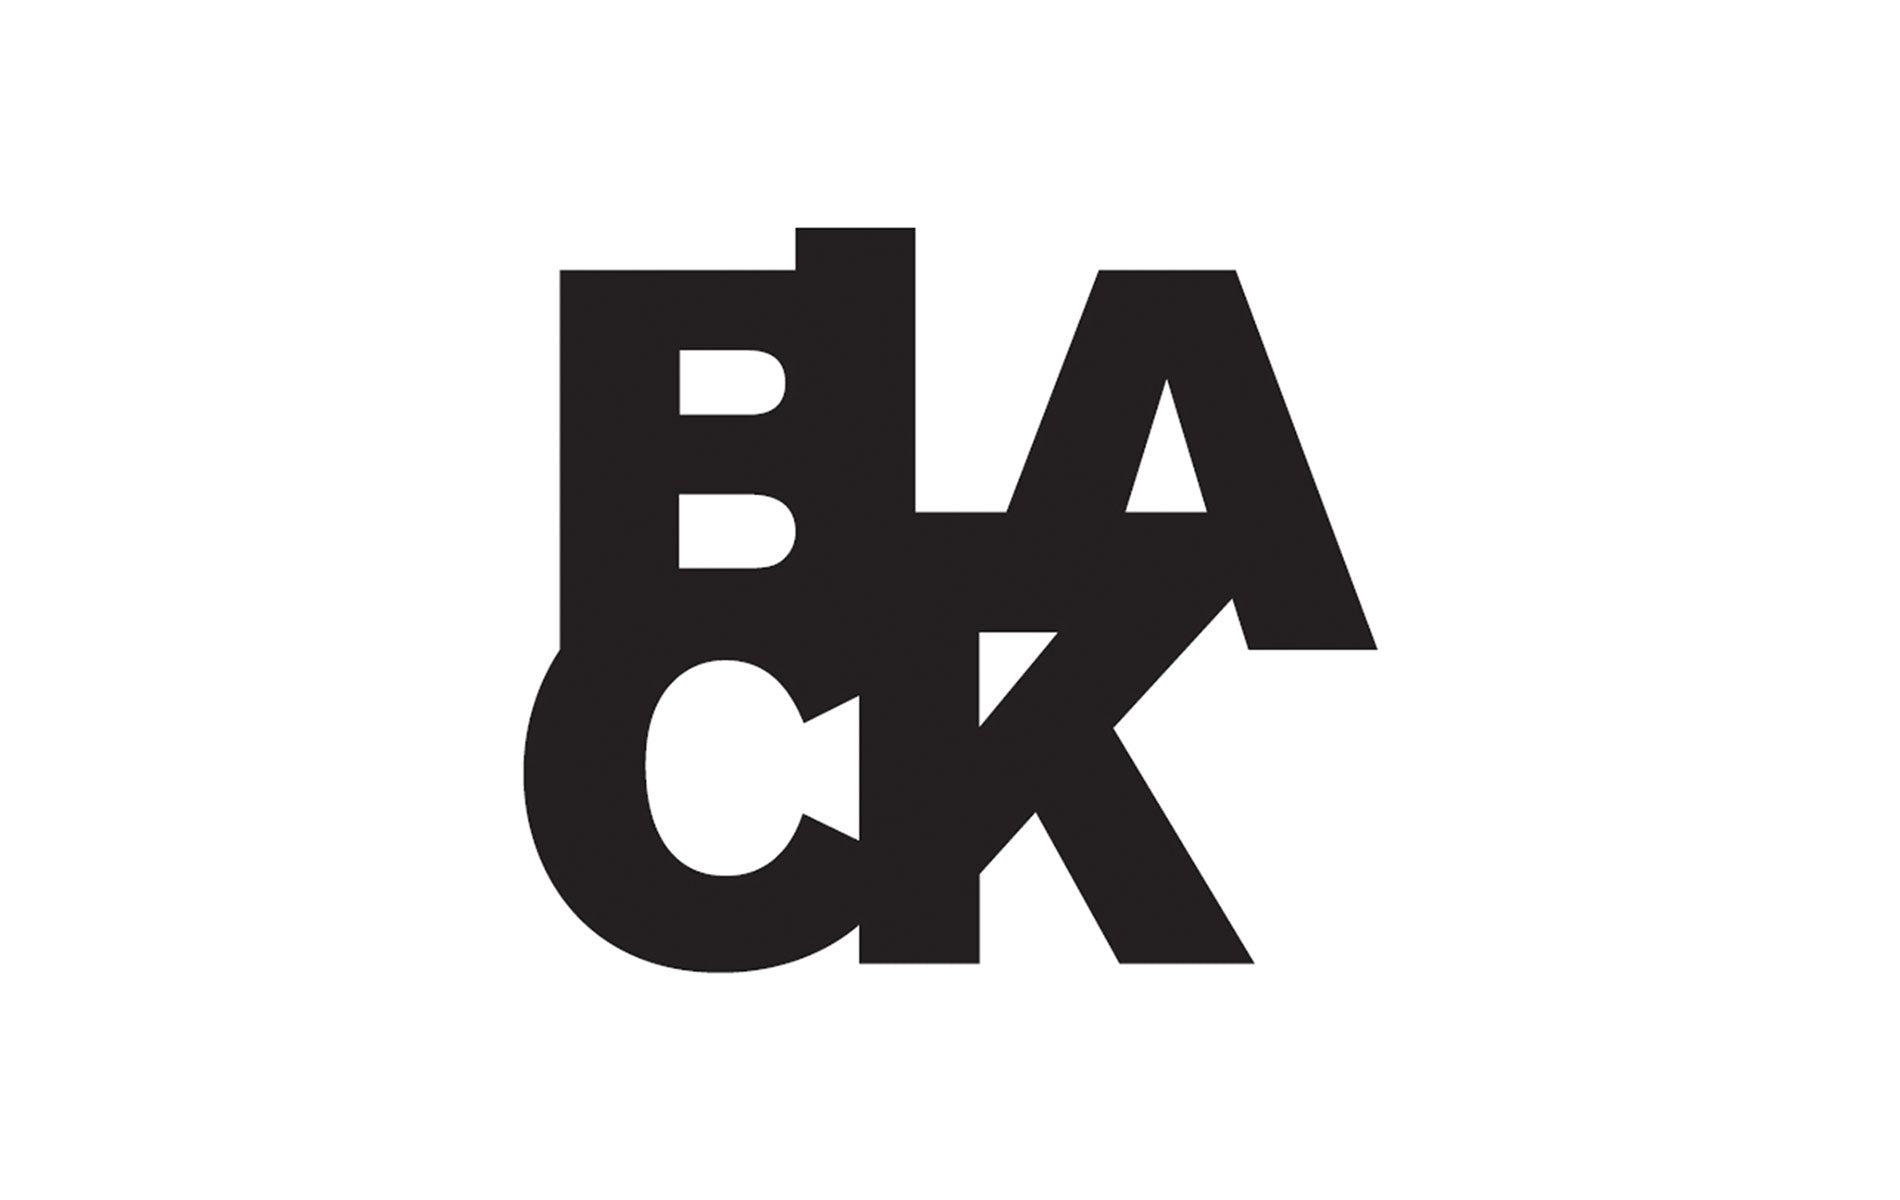 Black Eyewear company logo